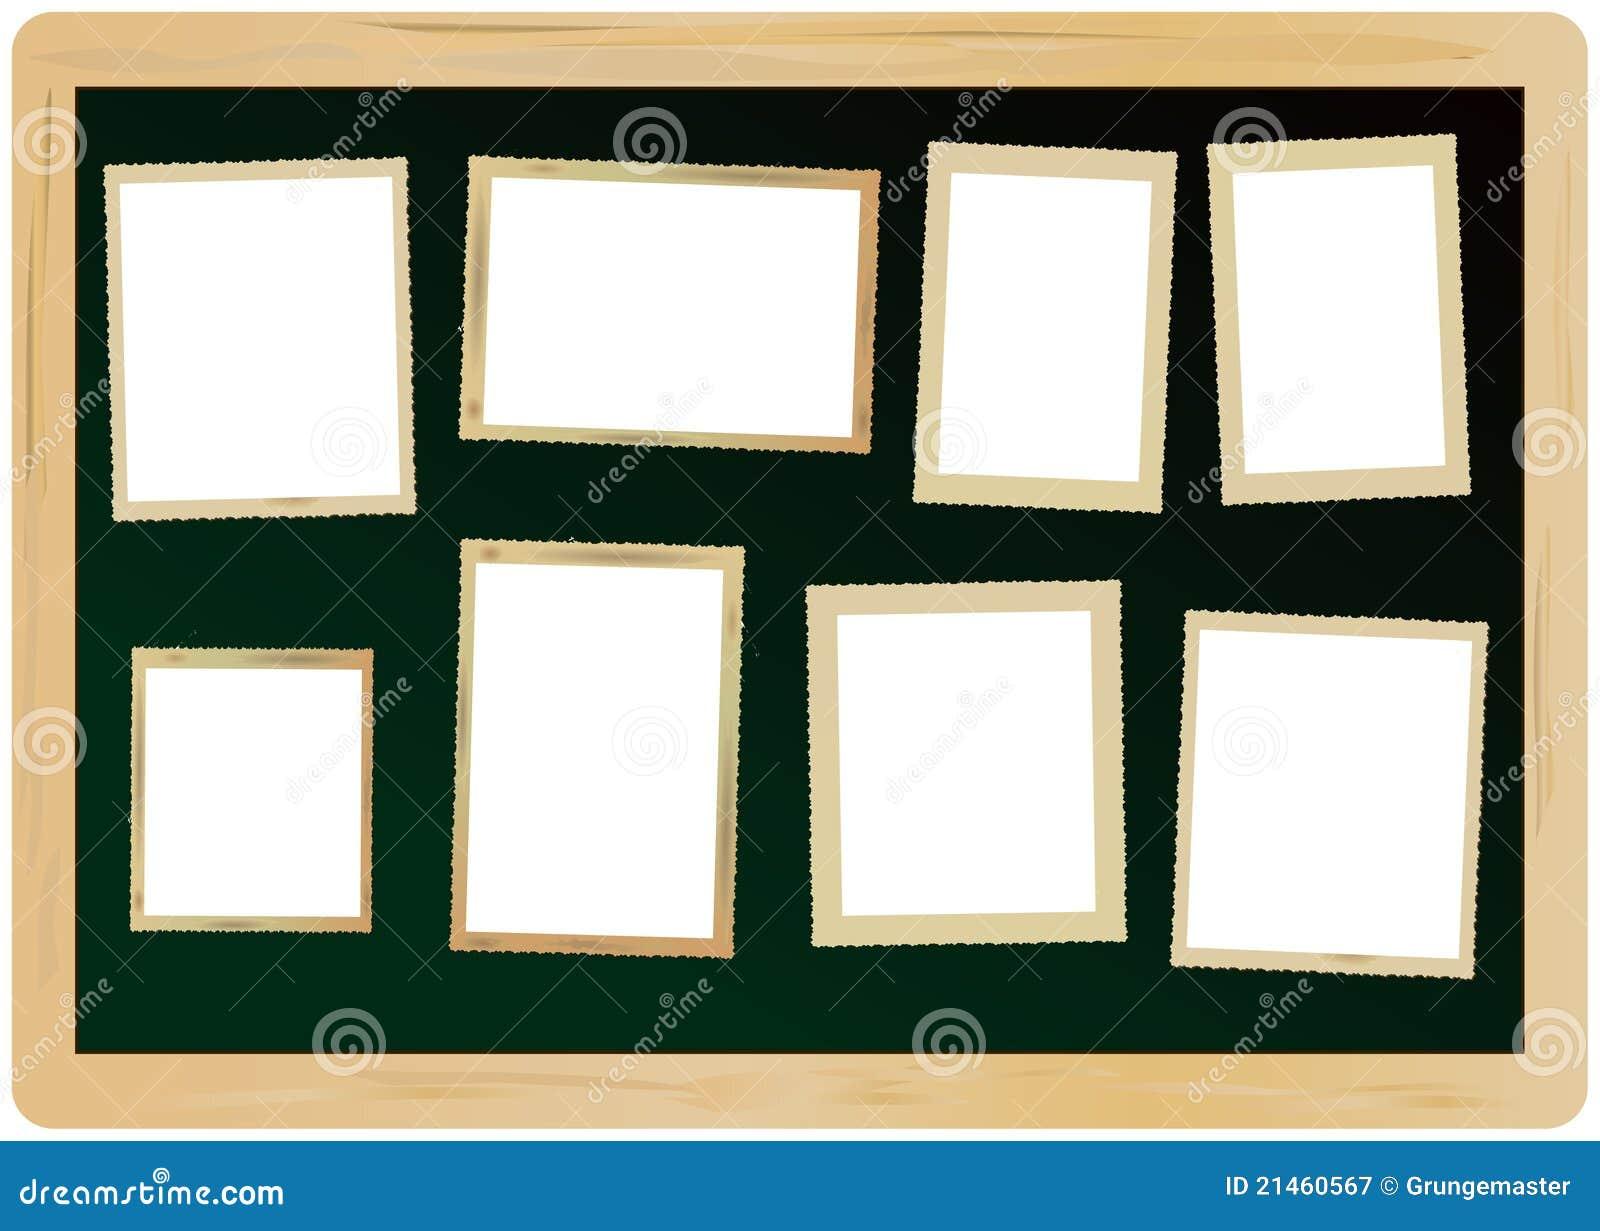 ppt 背景 背景图片 边框 门窗 模板 设计 相框 1300_1017图片